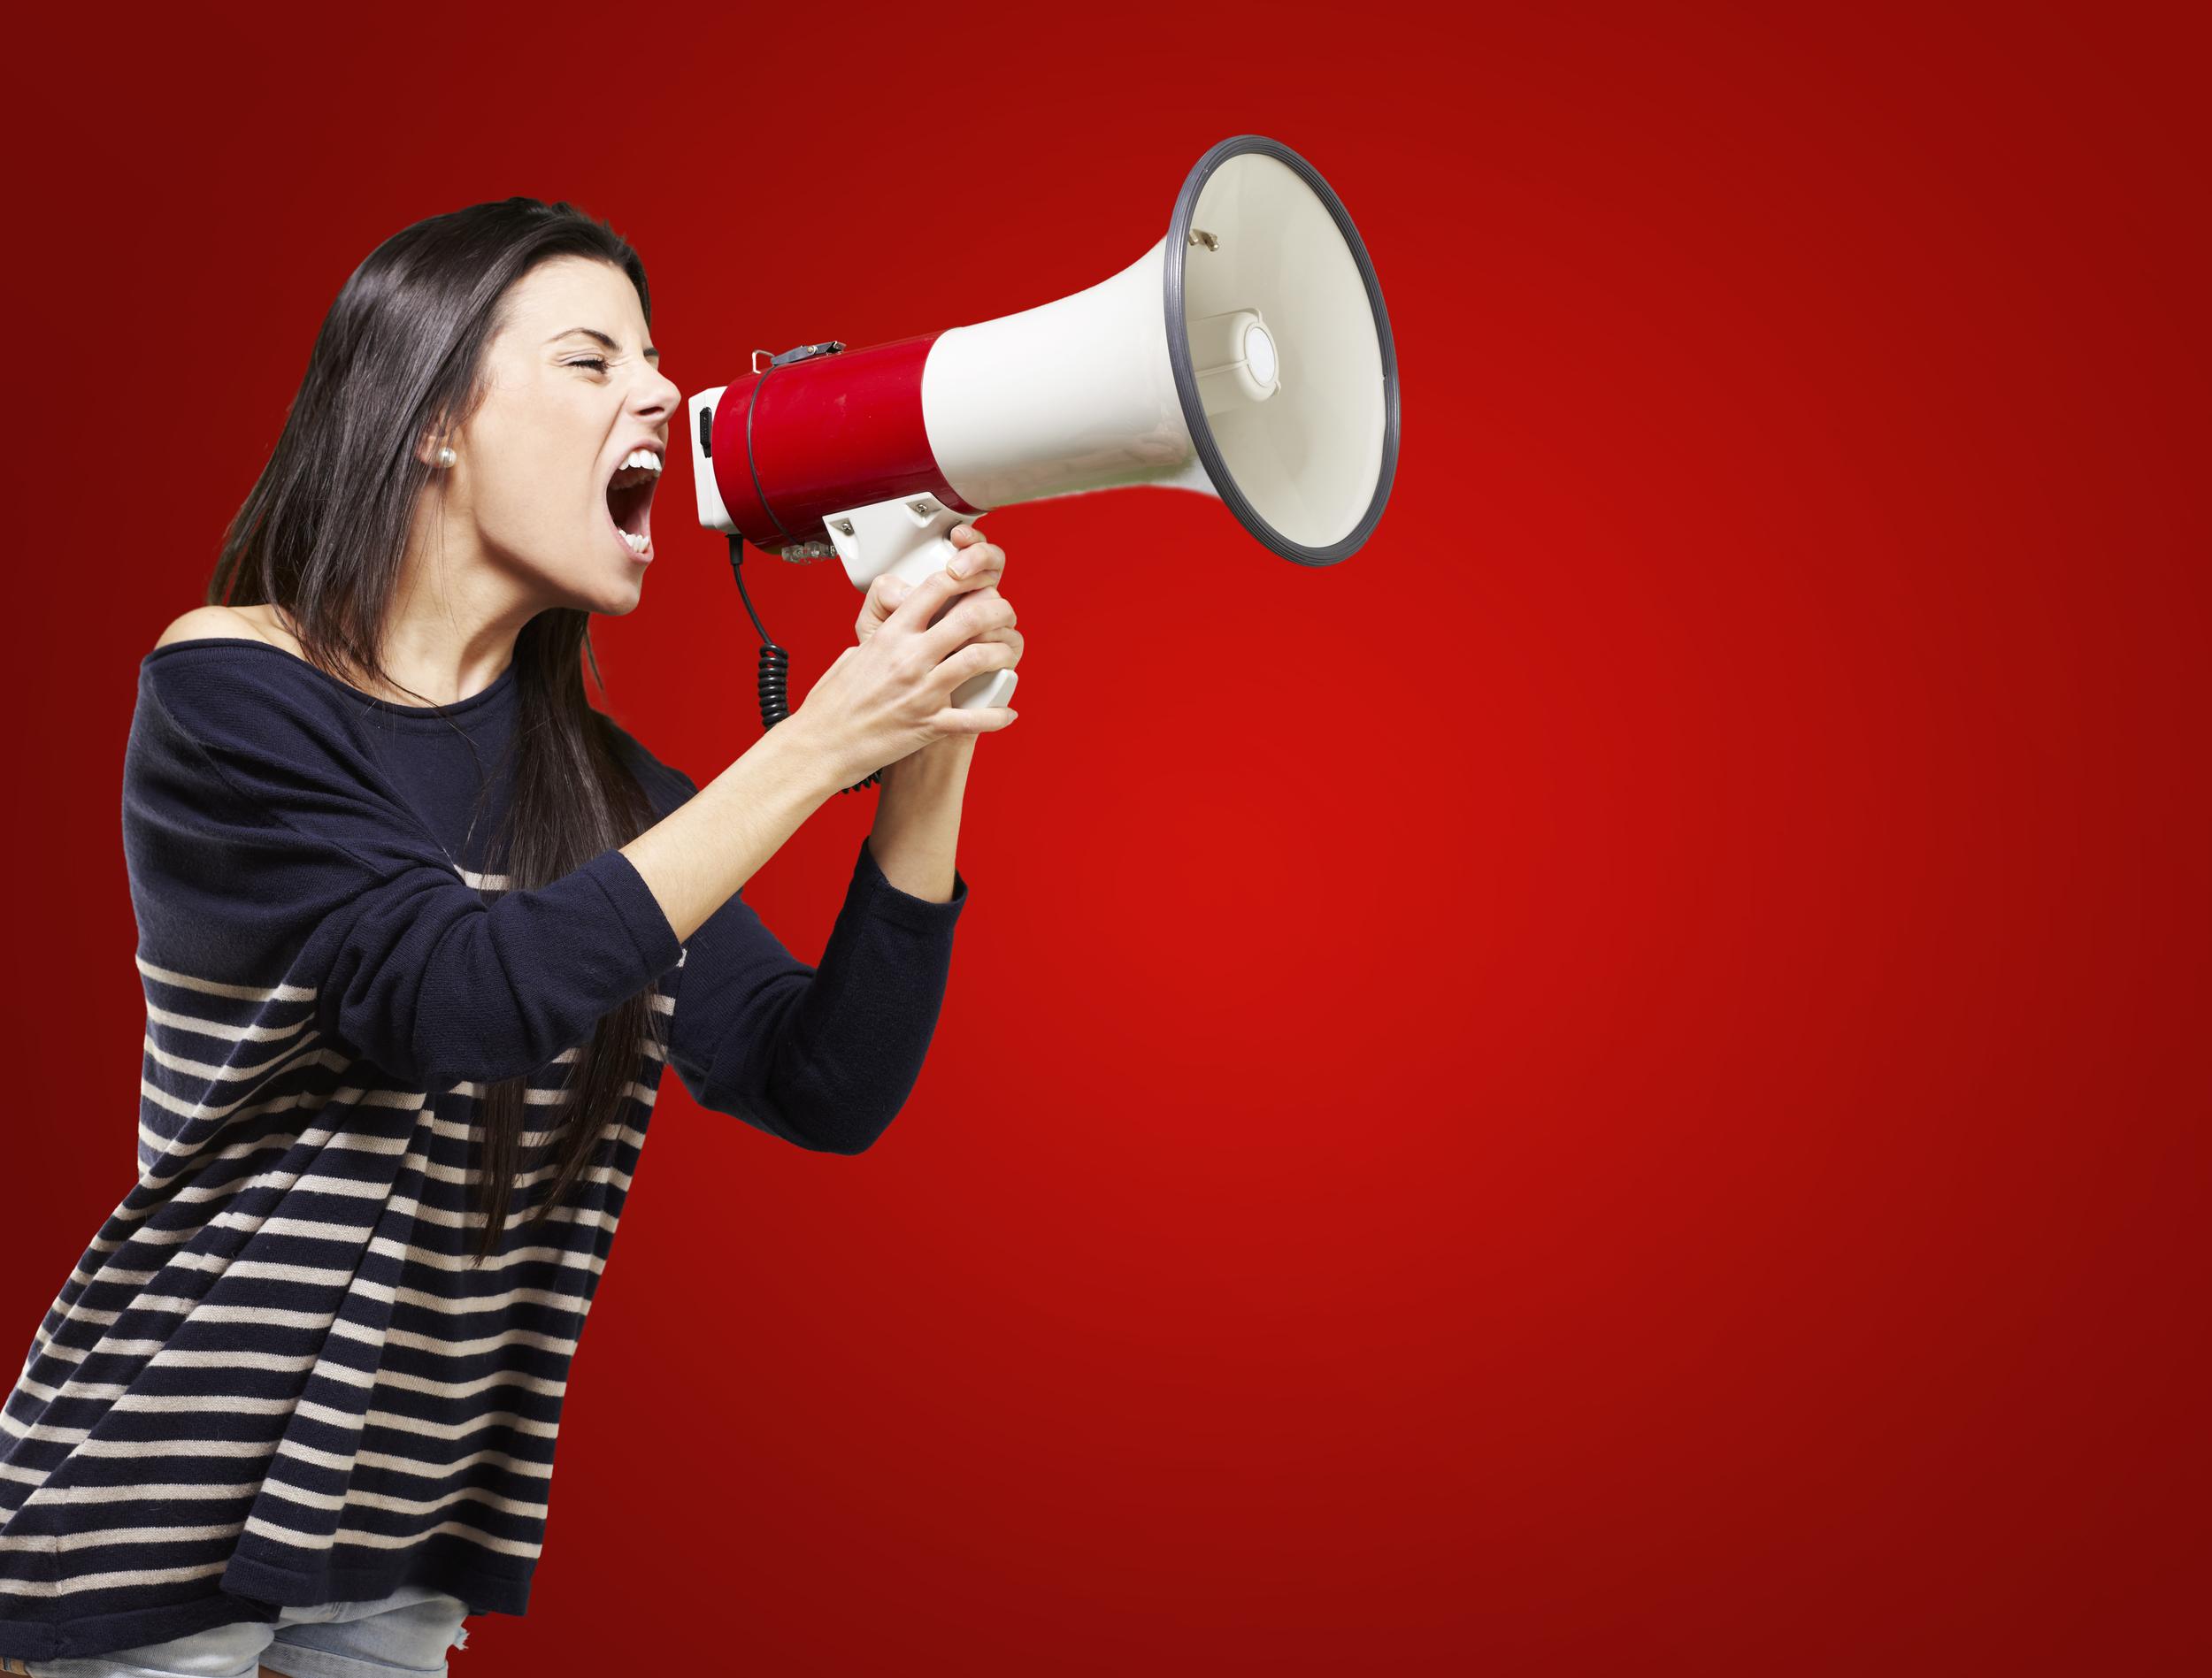 Greenlight Blog - Shouting